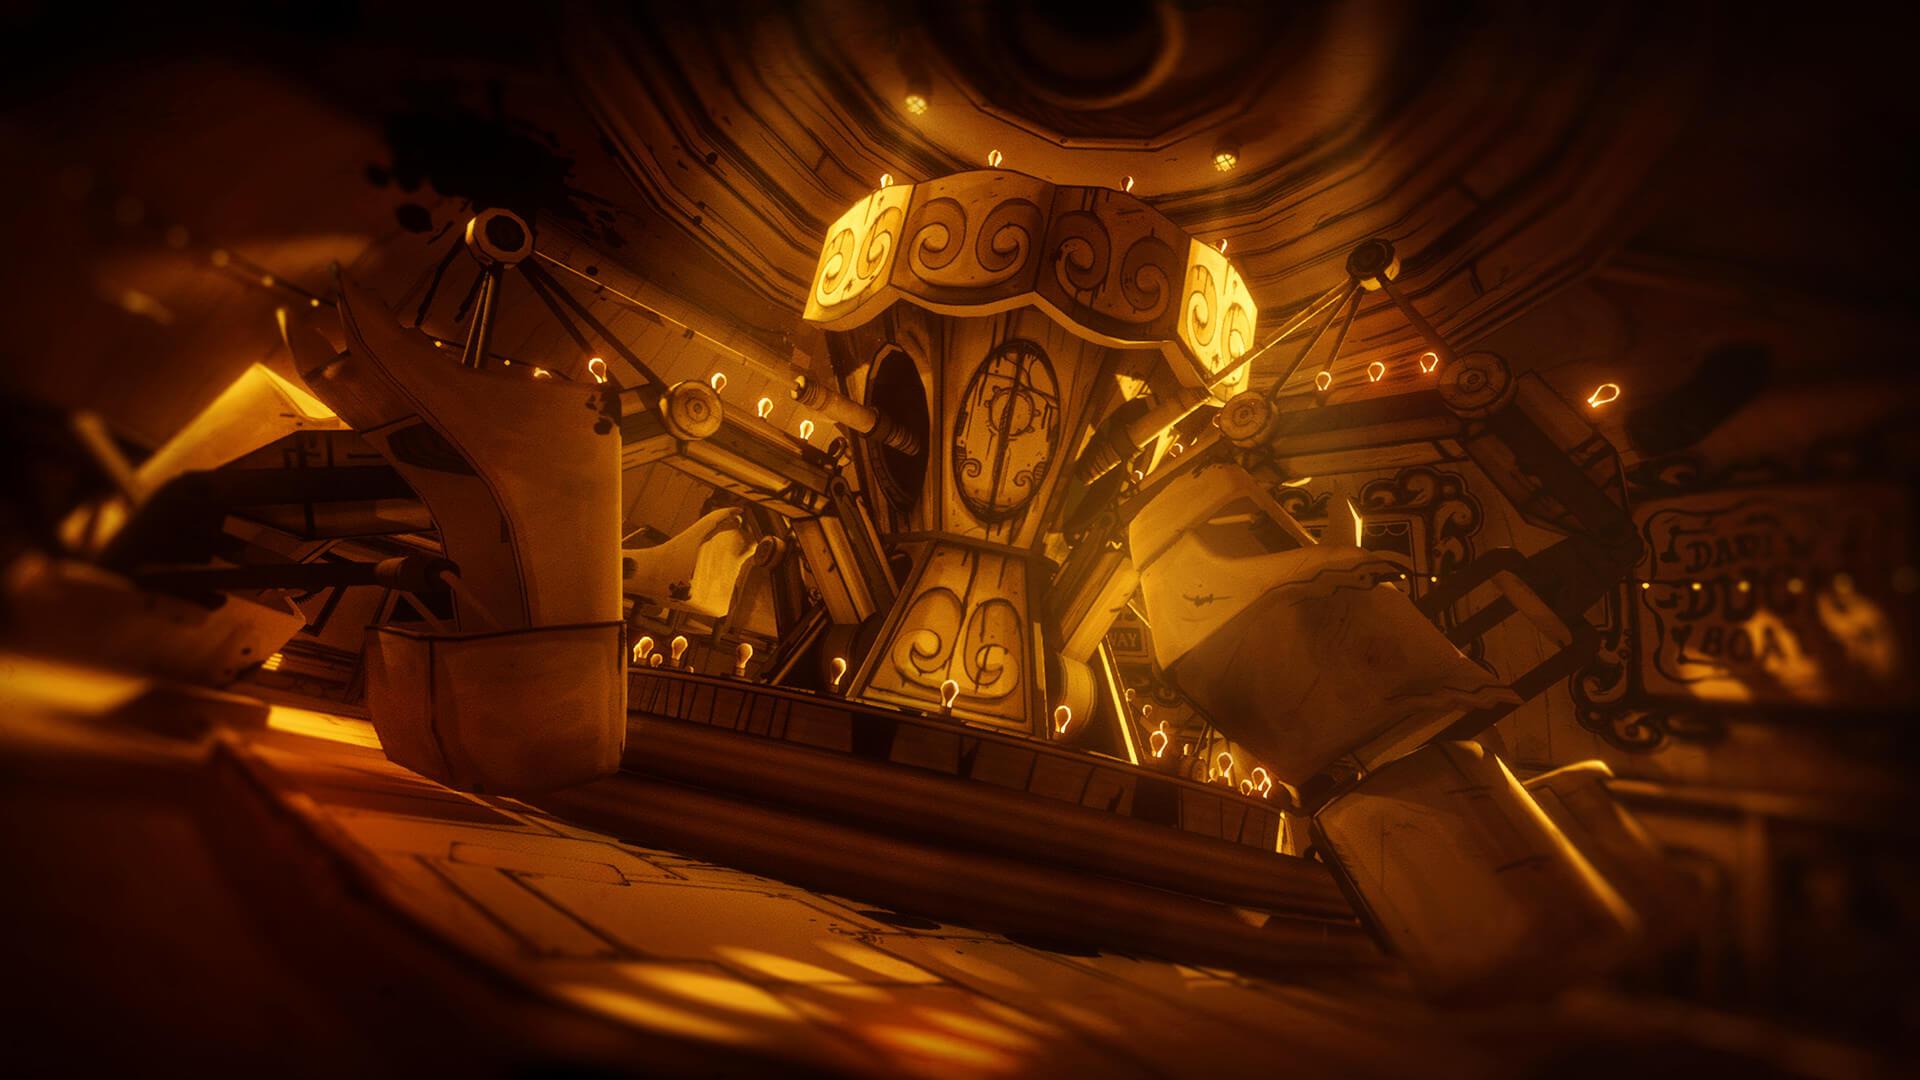 bendy and the ink machine oyun hikayesi